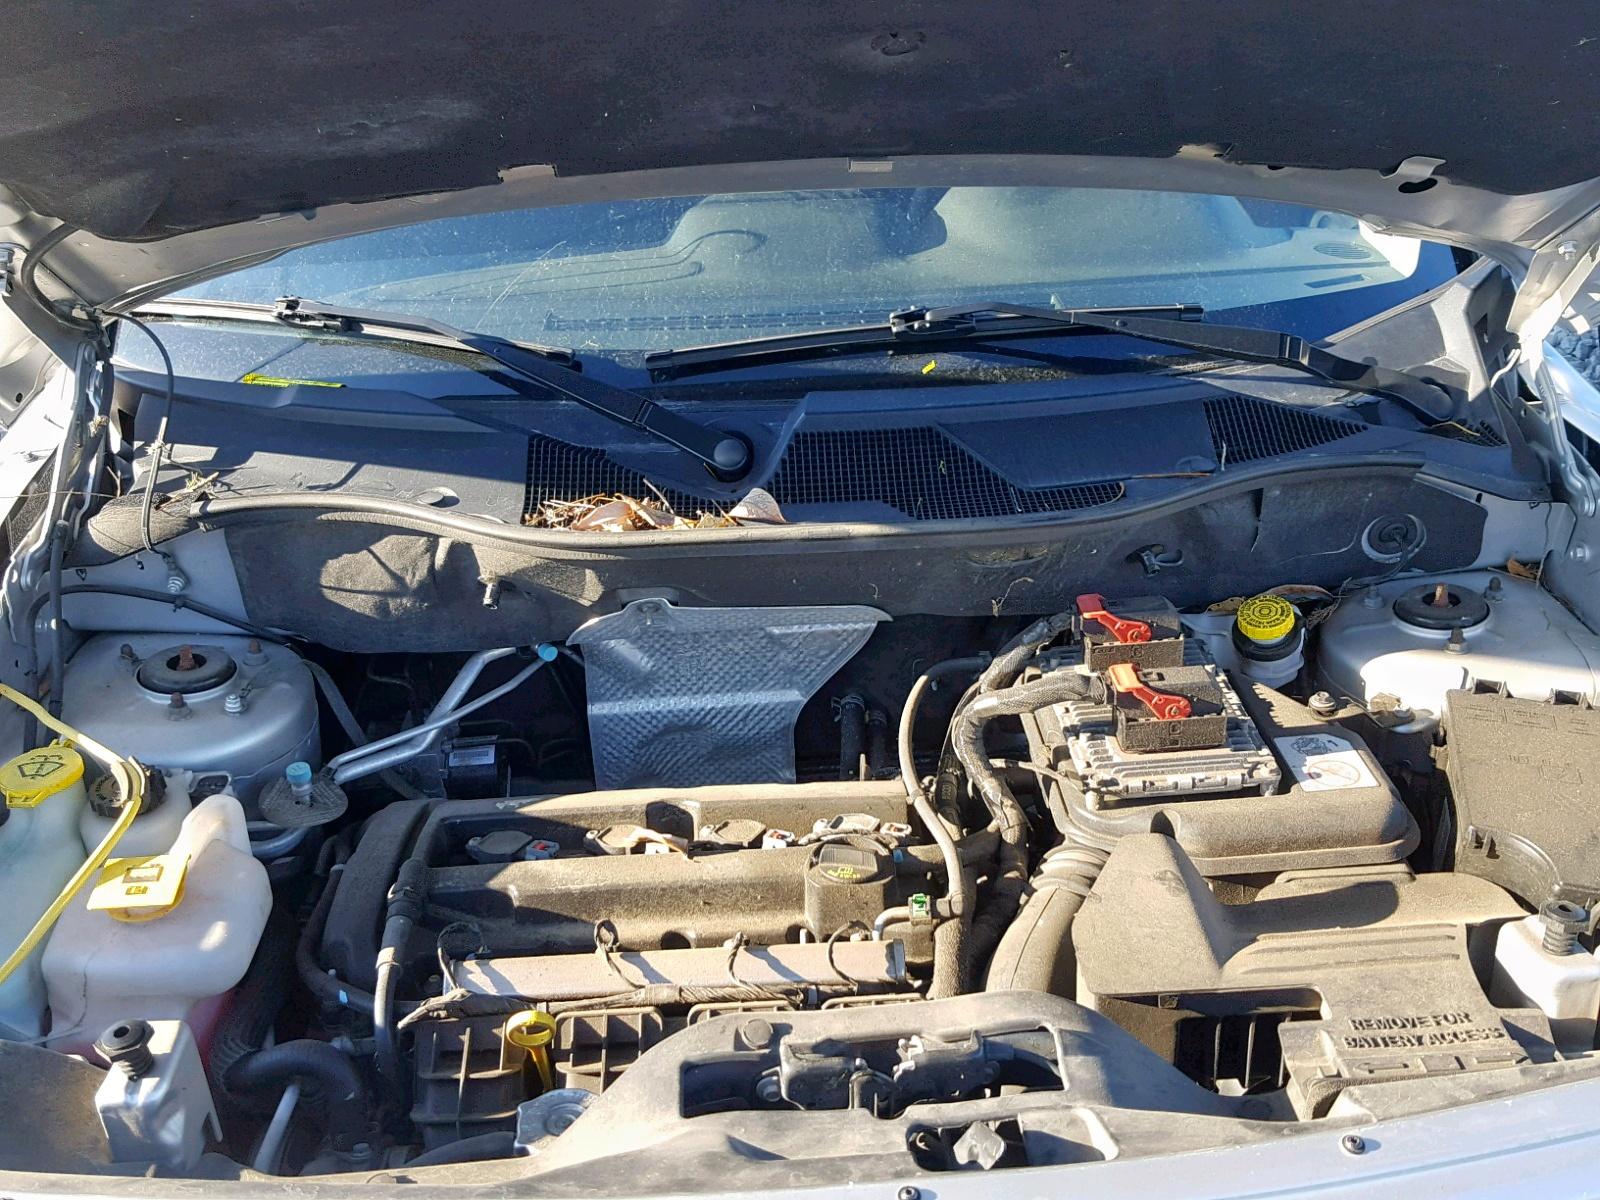 1C4NJPBA5DD272382 - 2013 Jeep Patriot Sp 2.0L inside view